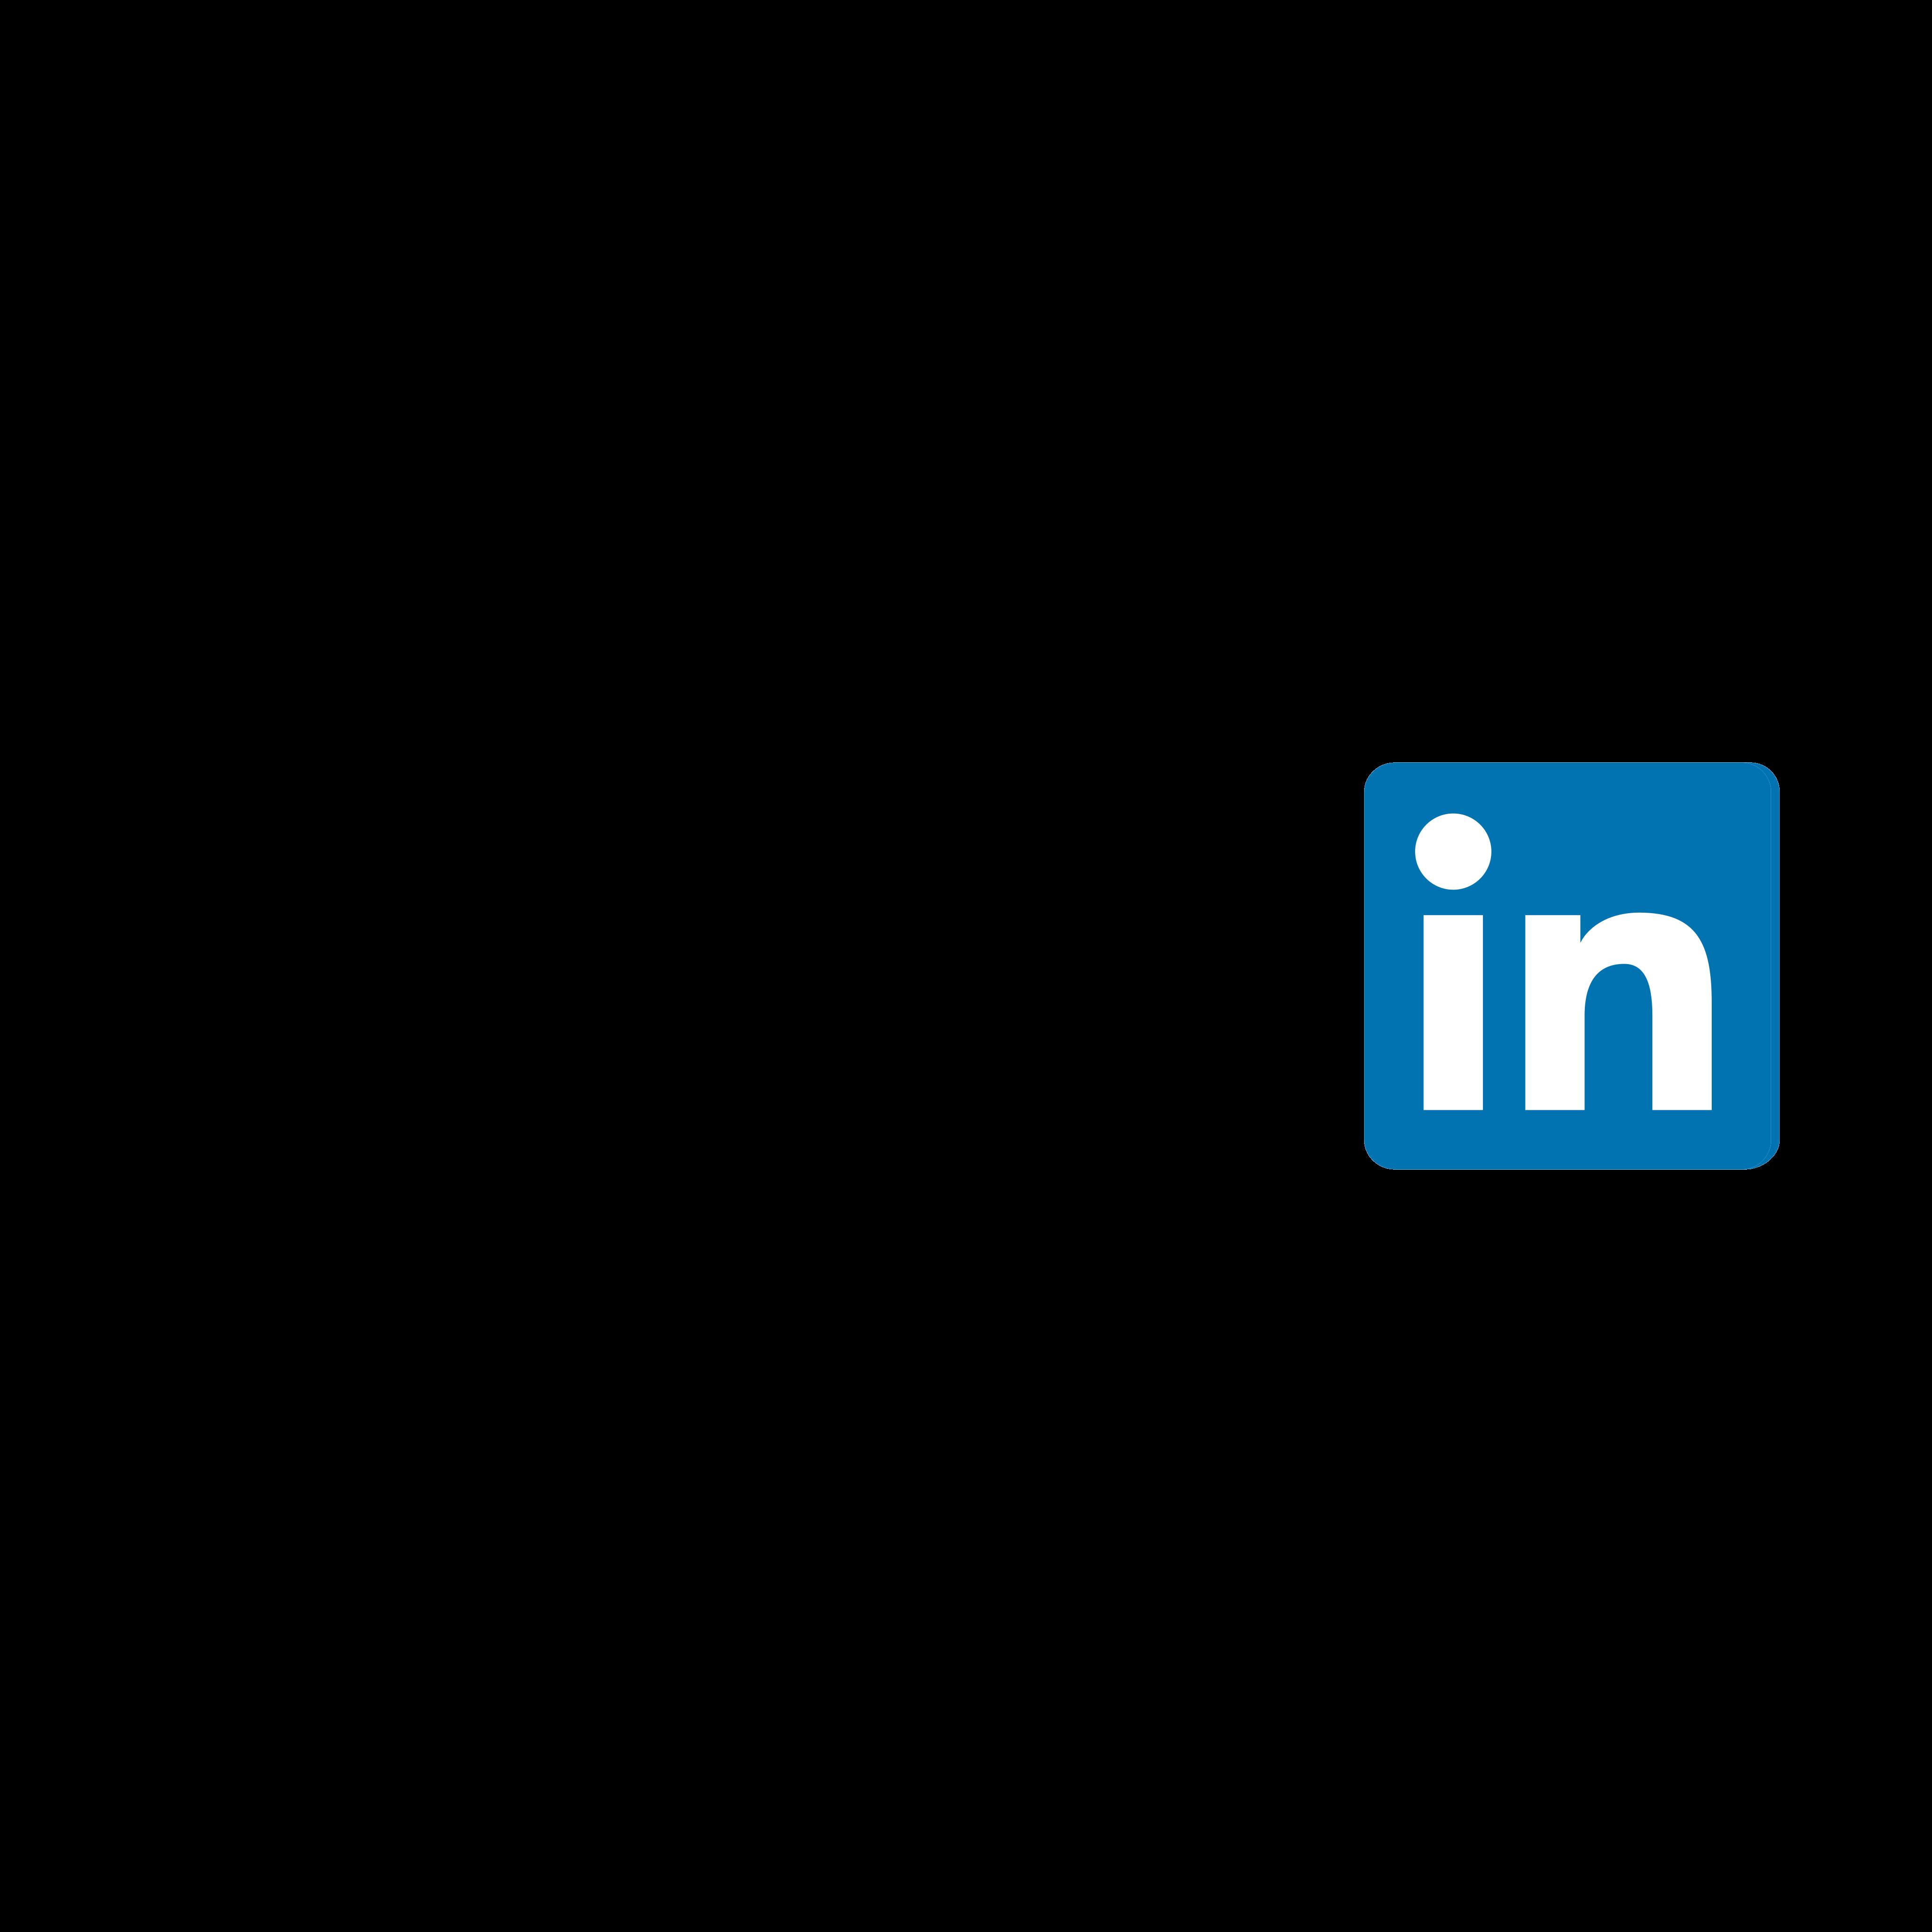 linkedIn logo 0 - LinkedIn Logo